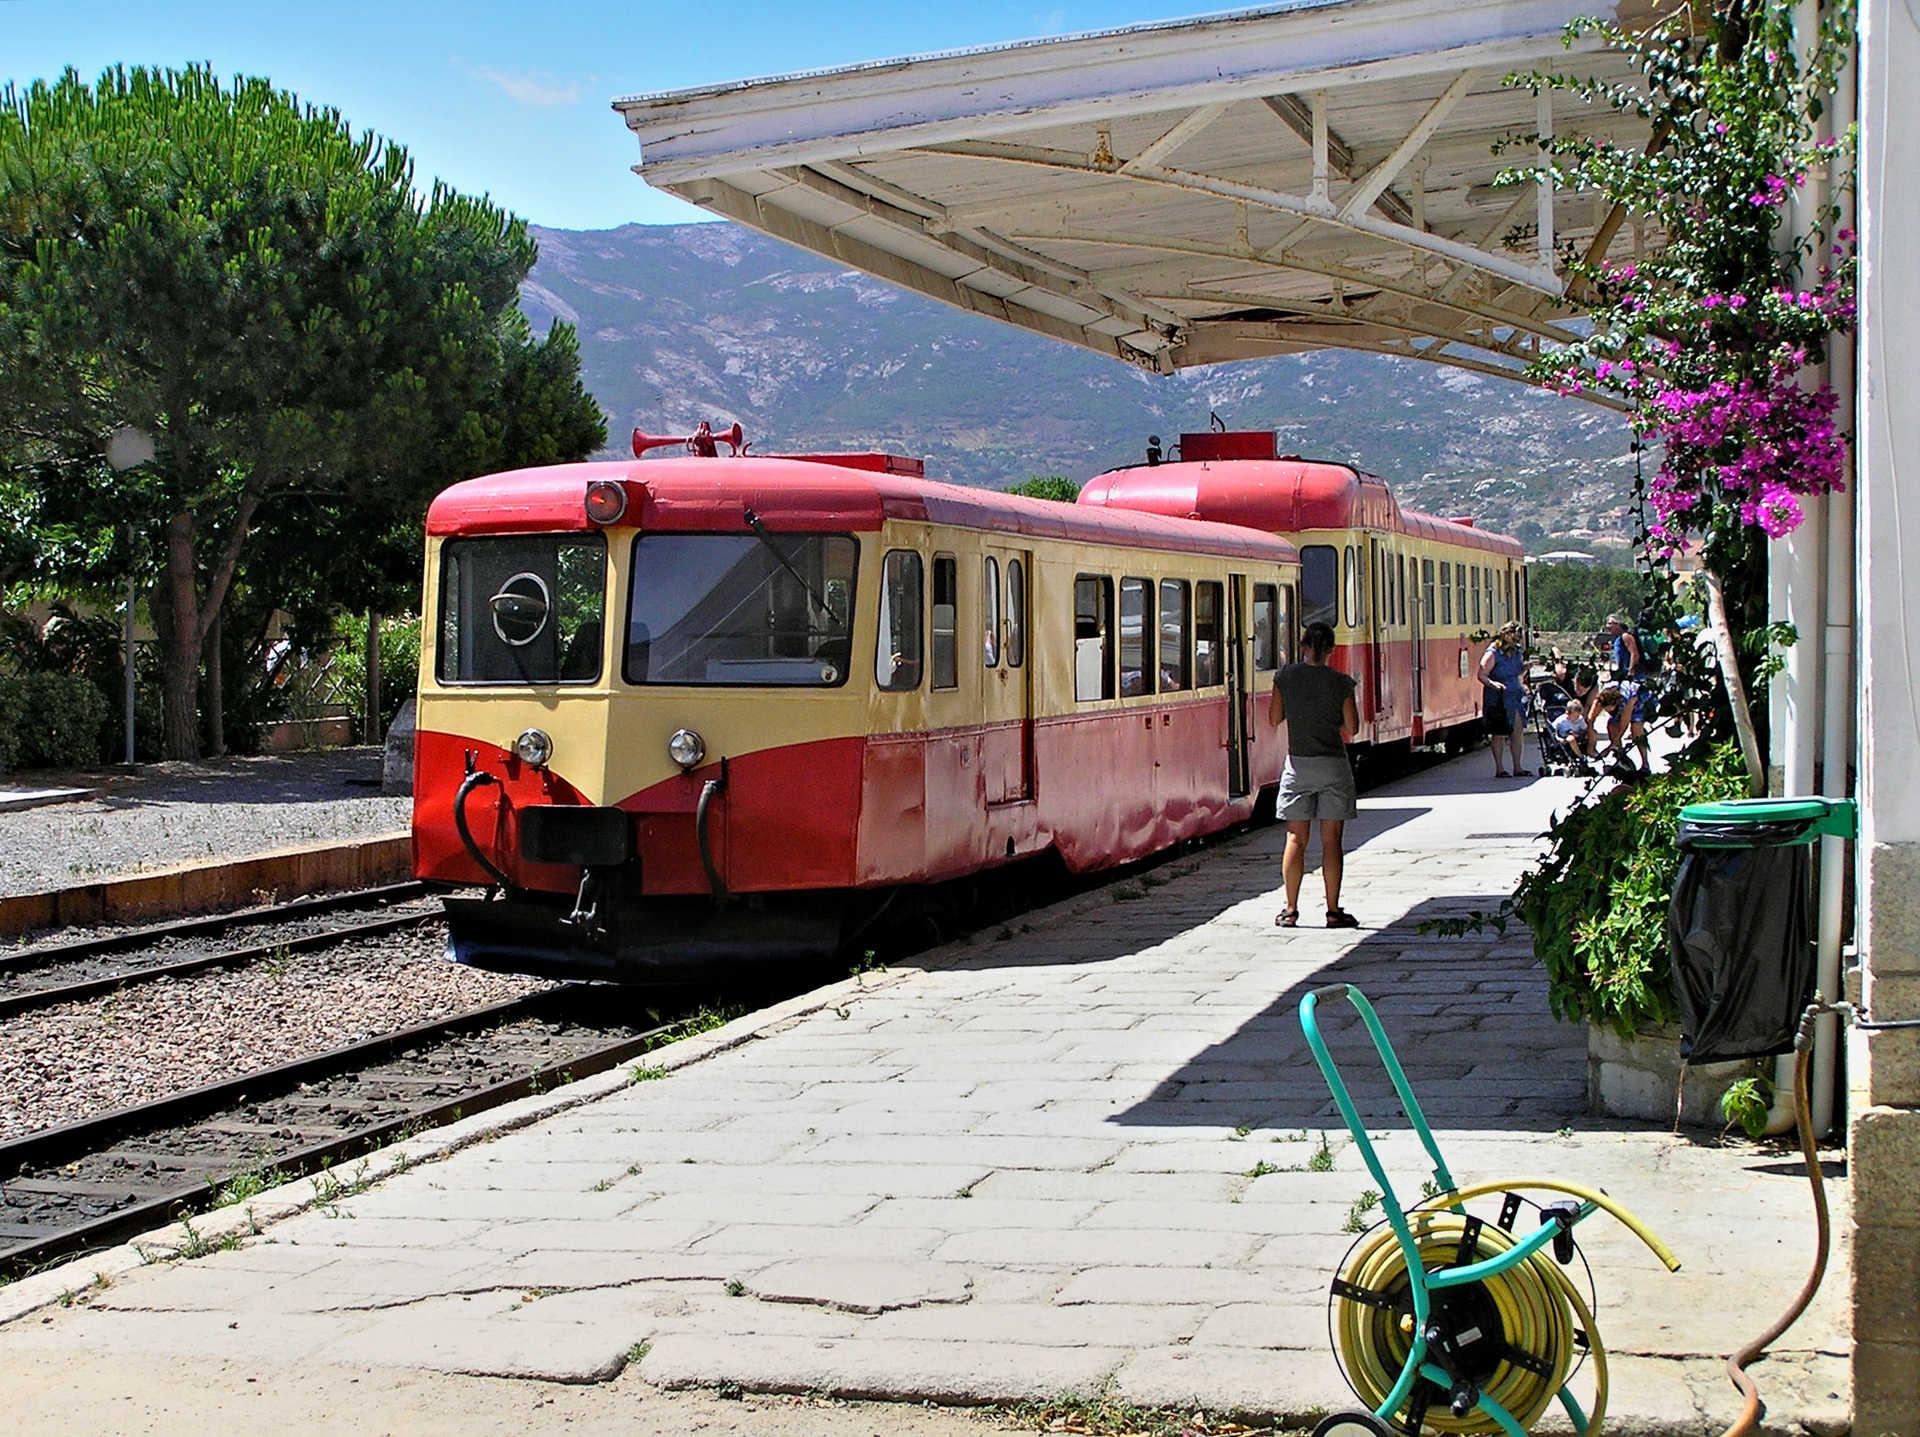 Gare de Calvi lors de la traversée de la Corse en train